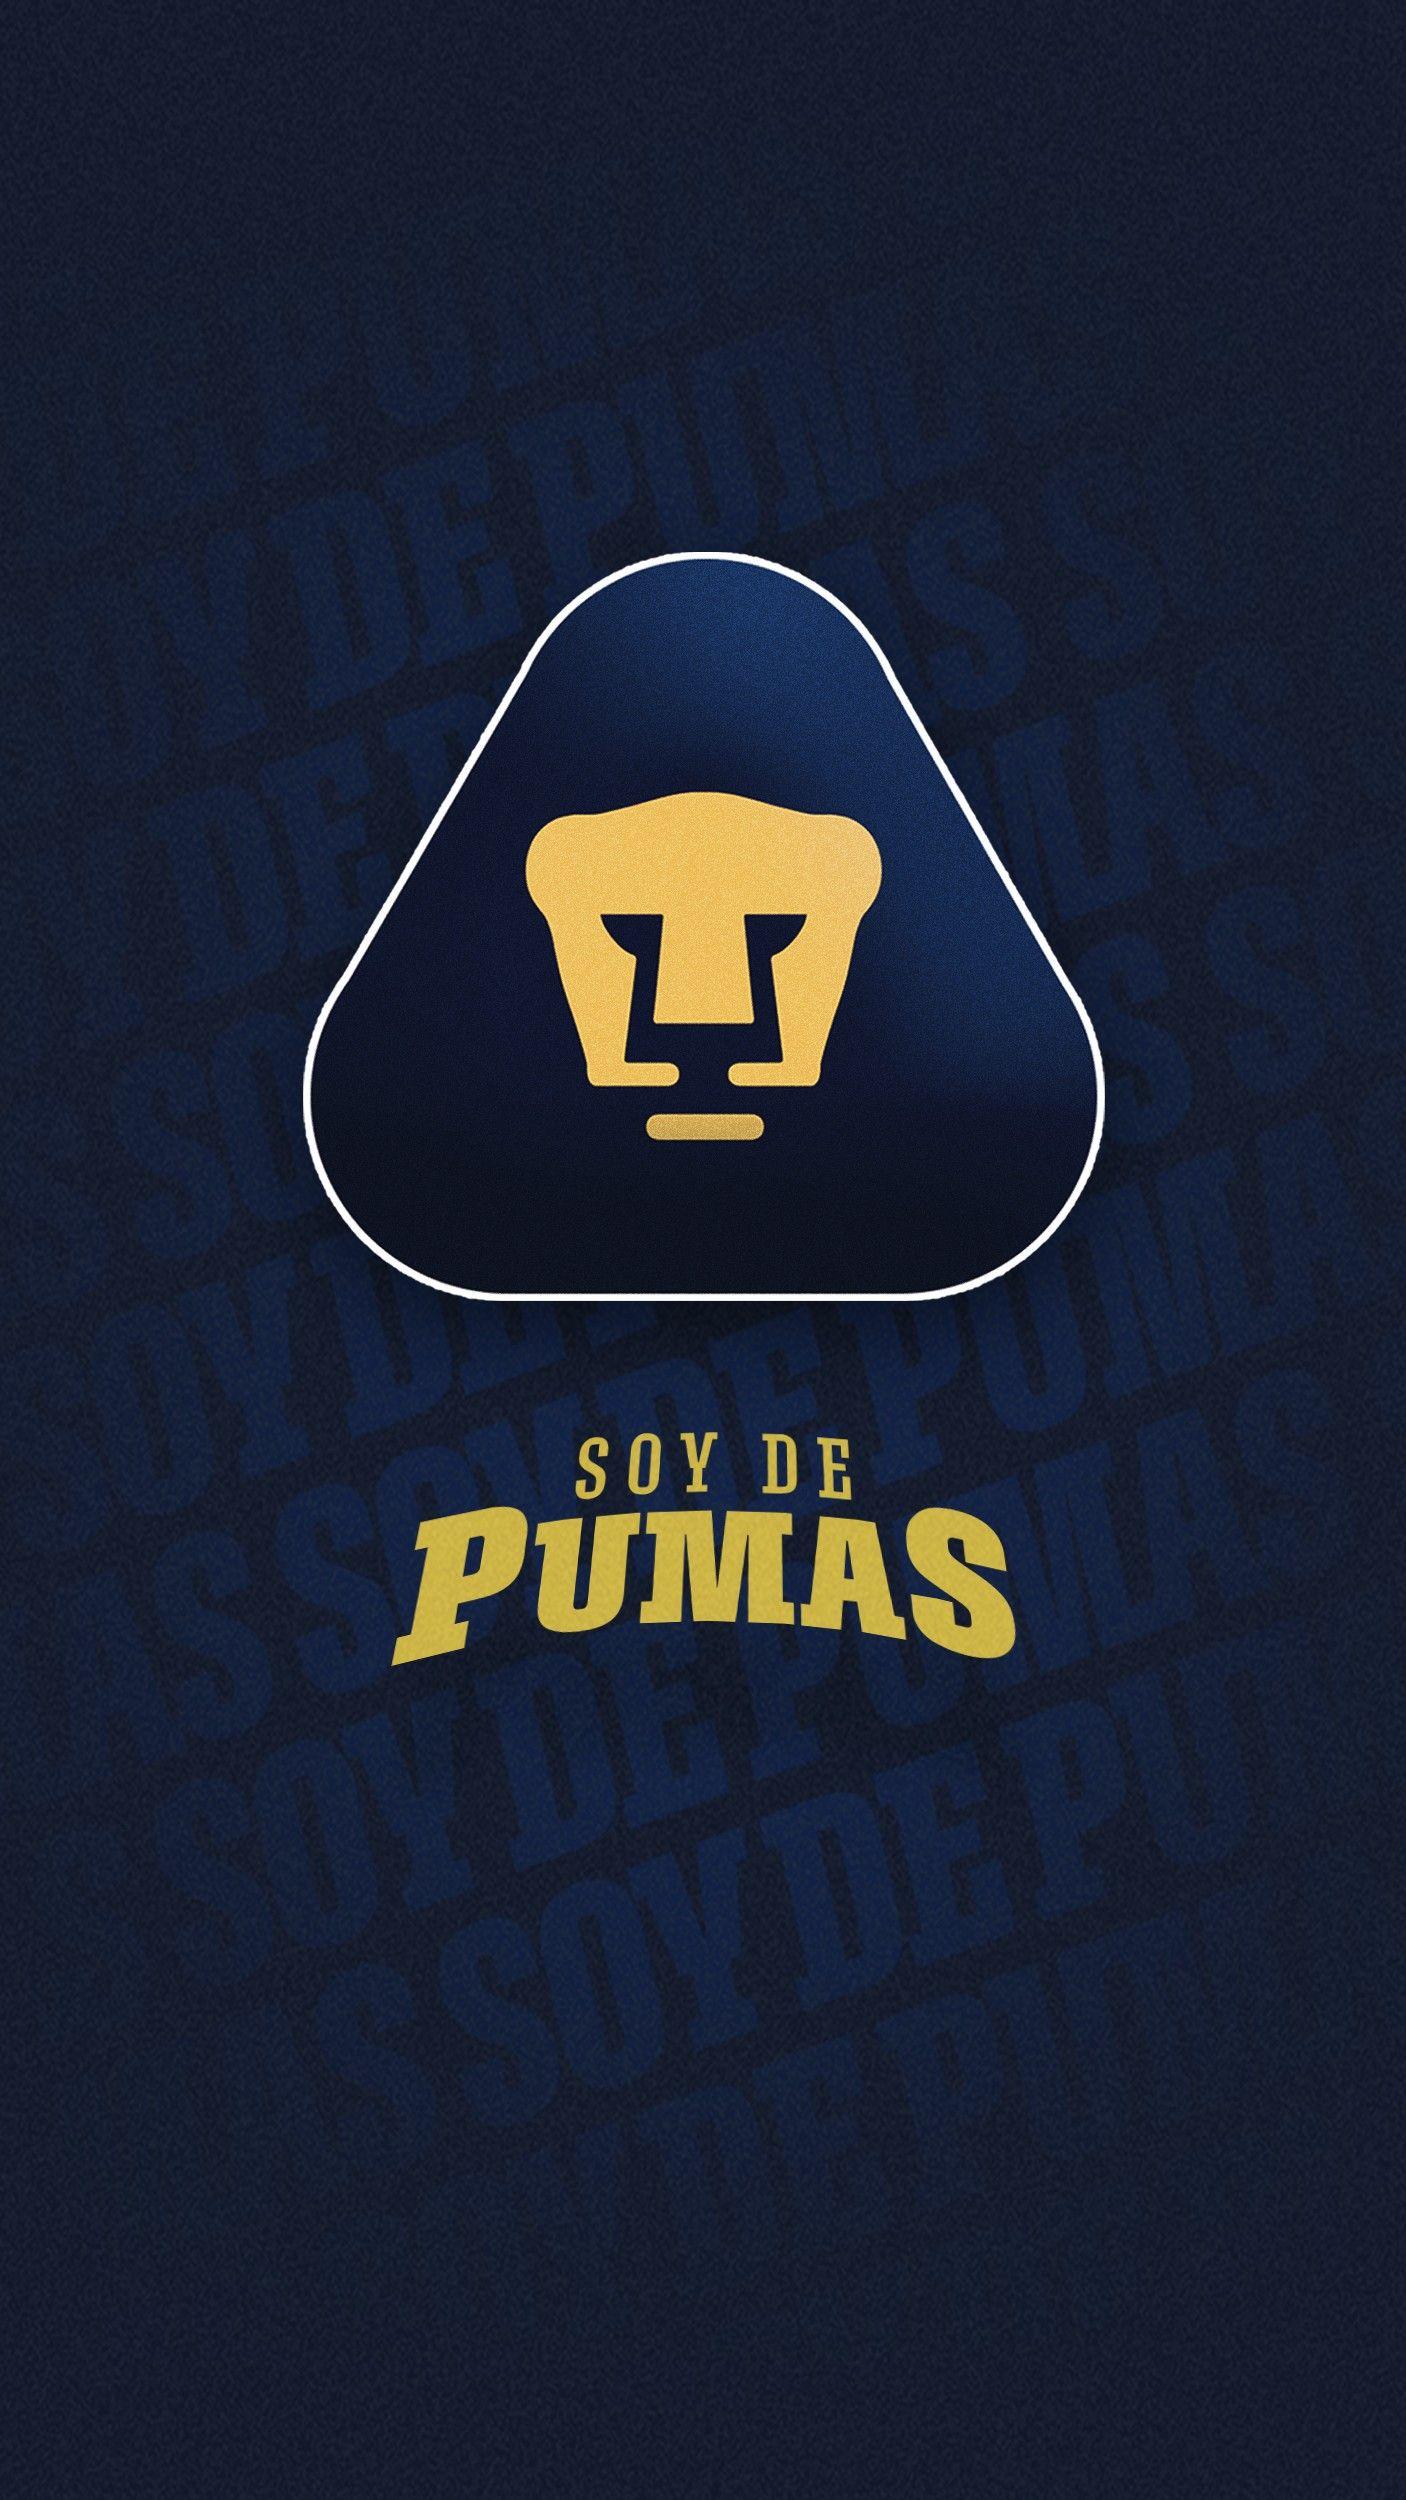 Fondo Pumas Pumas Unam Wallpapers Pumas Equipo Pumas